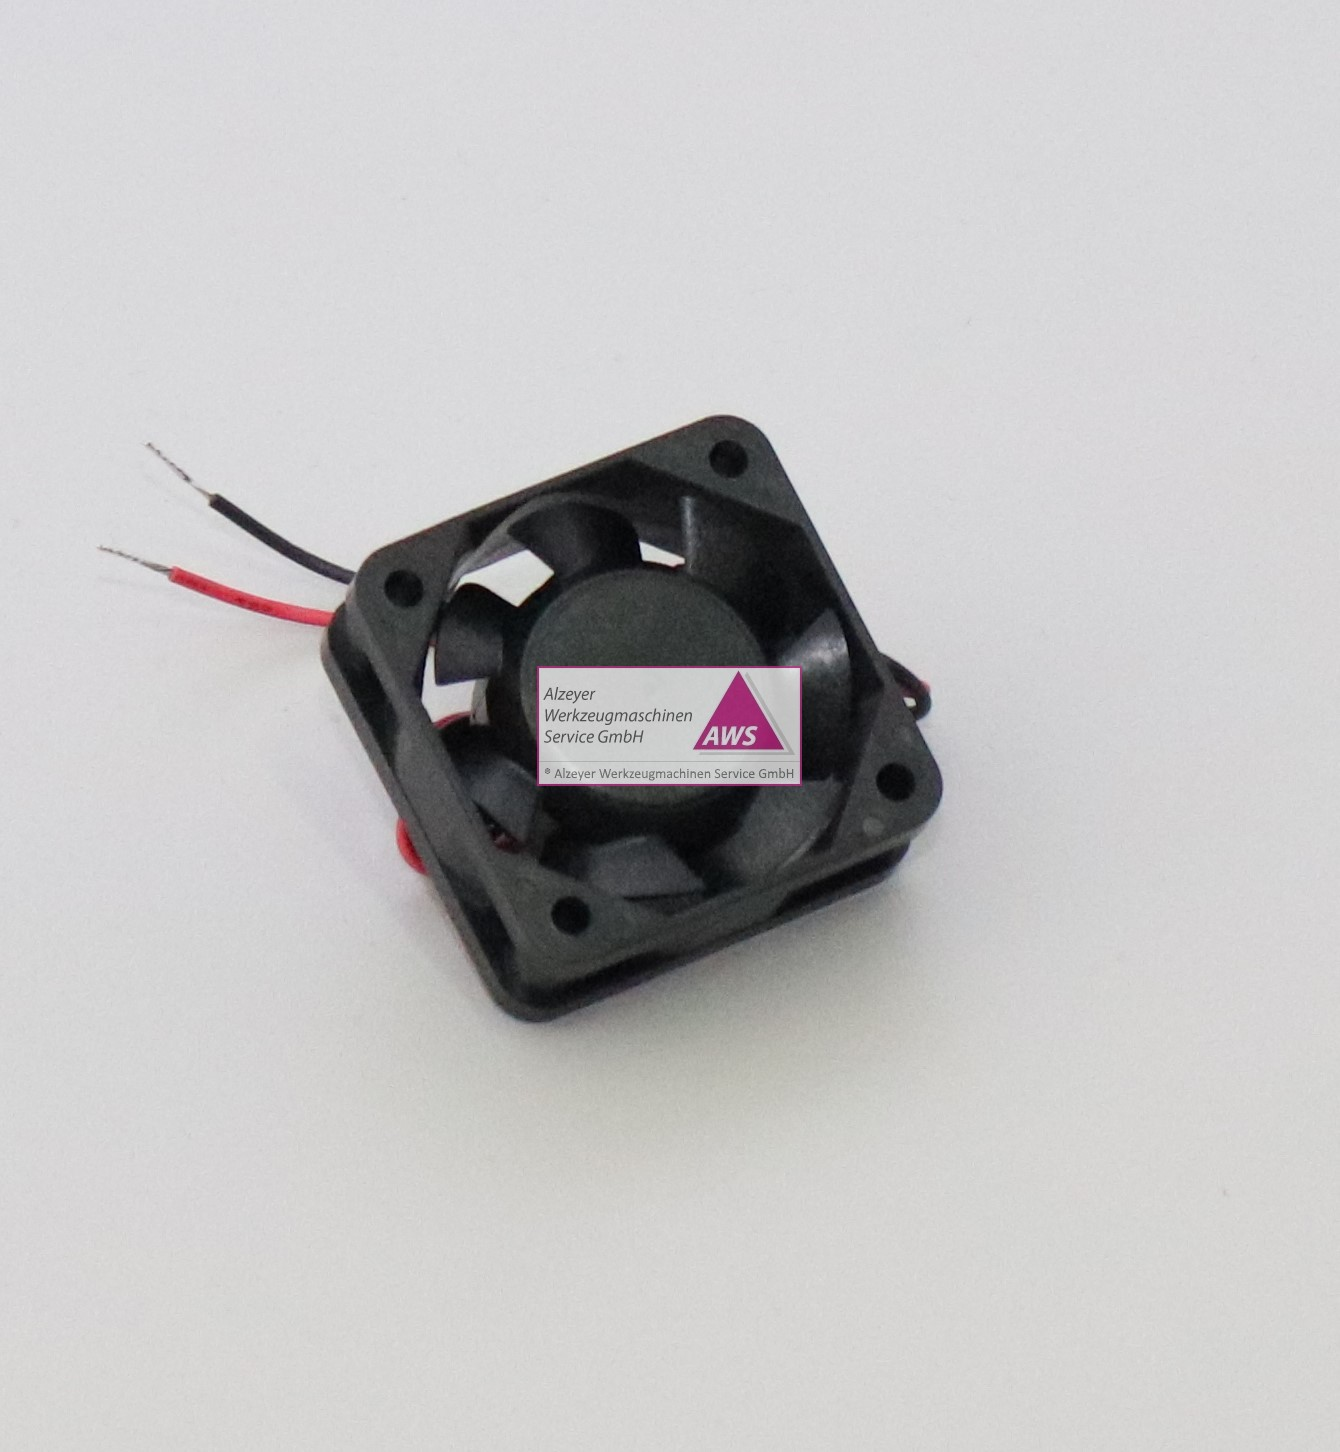 Ventilator Viereckig 40x40x15mm dick (24VDC)